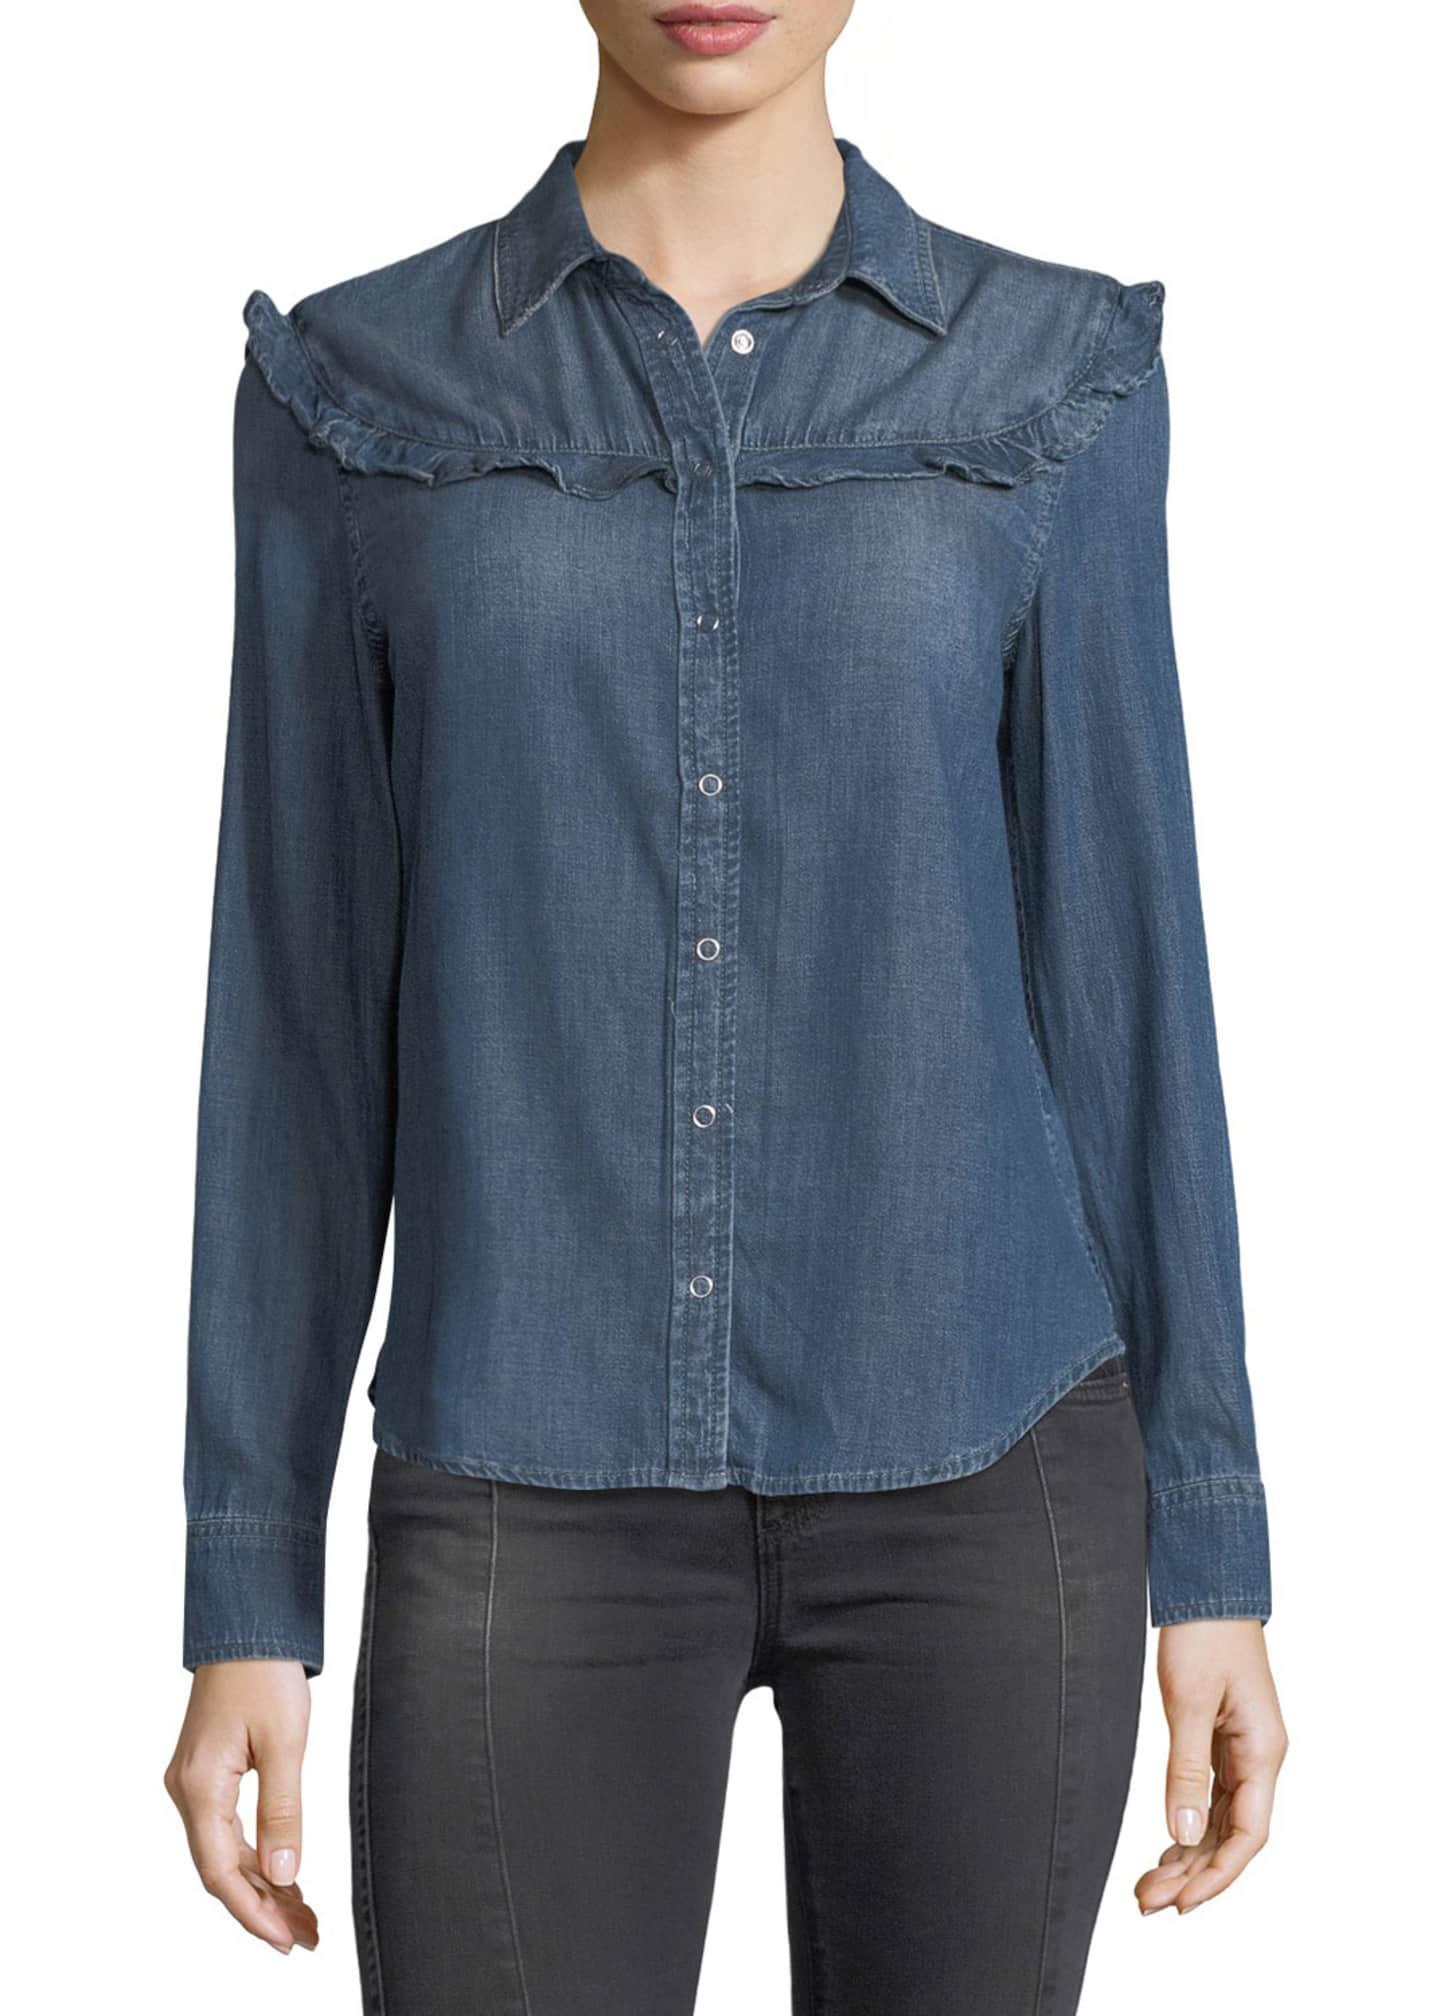 AG Adriano Goldschmied Joanna Spread-Collar Snap Denim Shirt